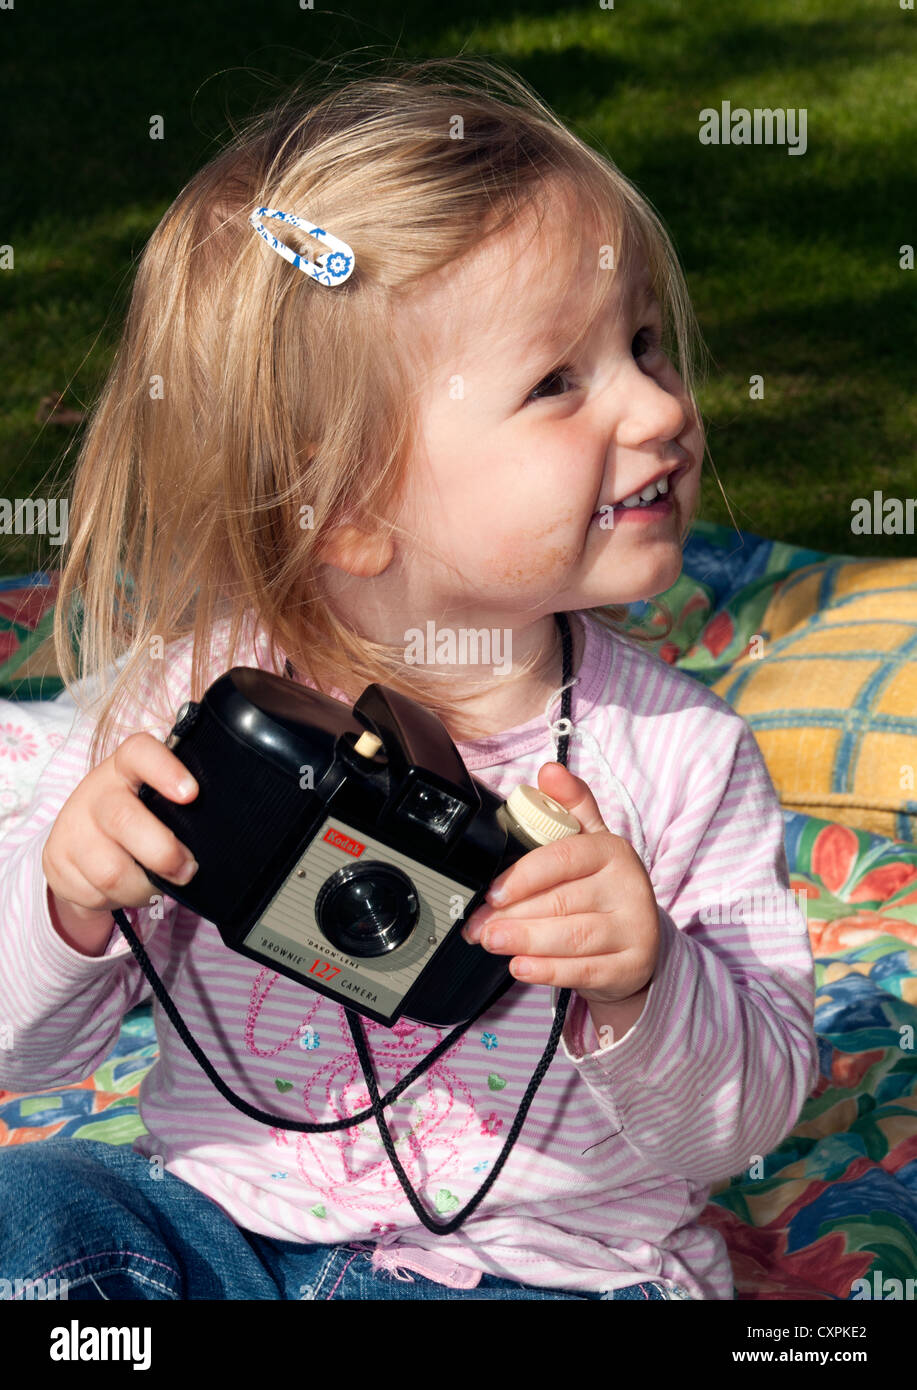 Young girl playing with Kodak Brownie camera. - Stock Image